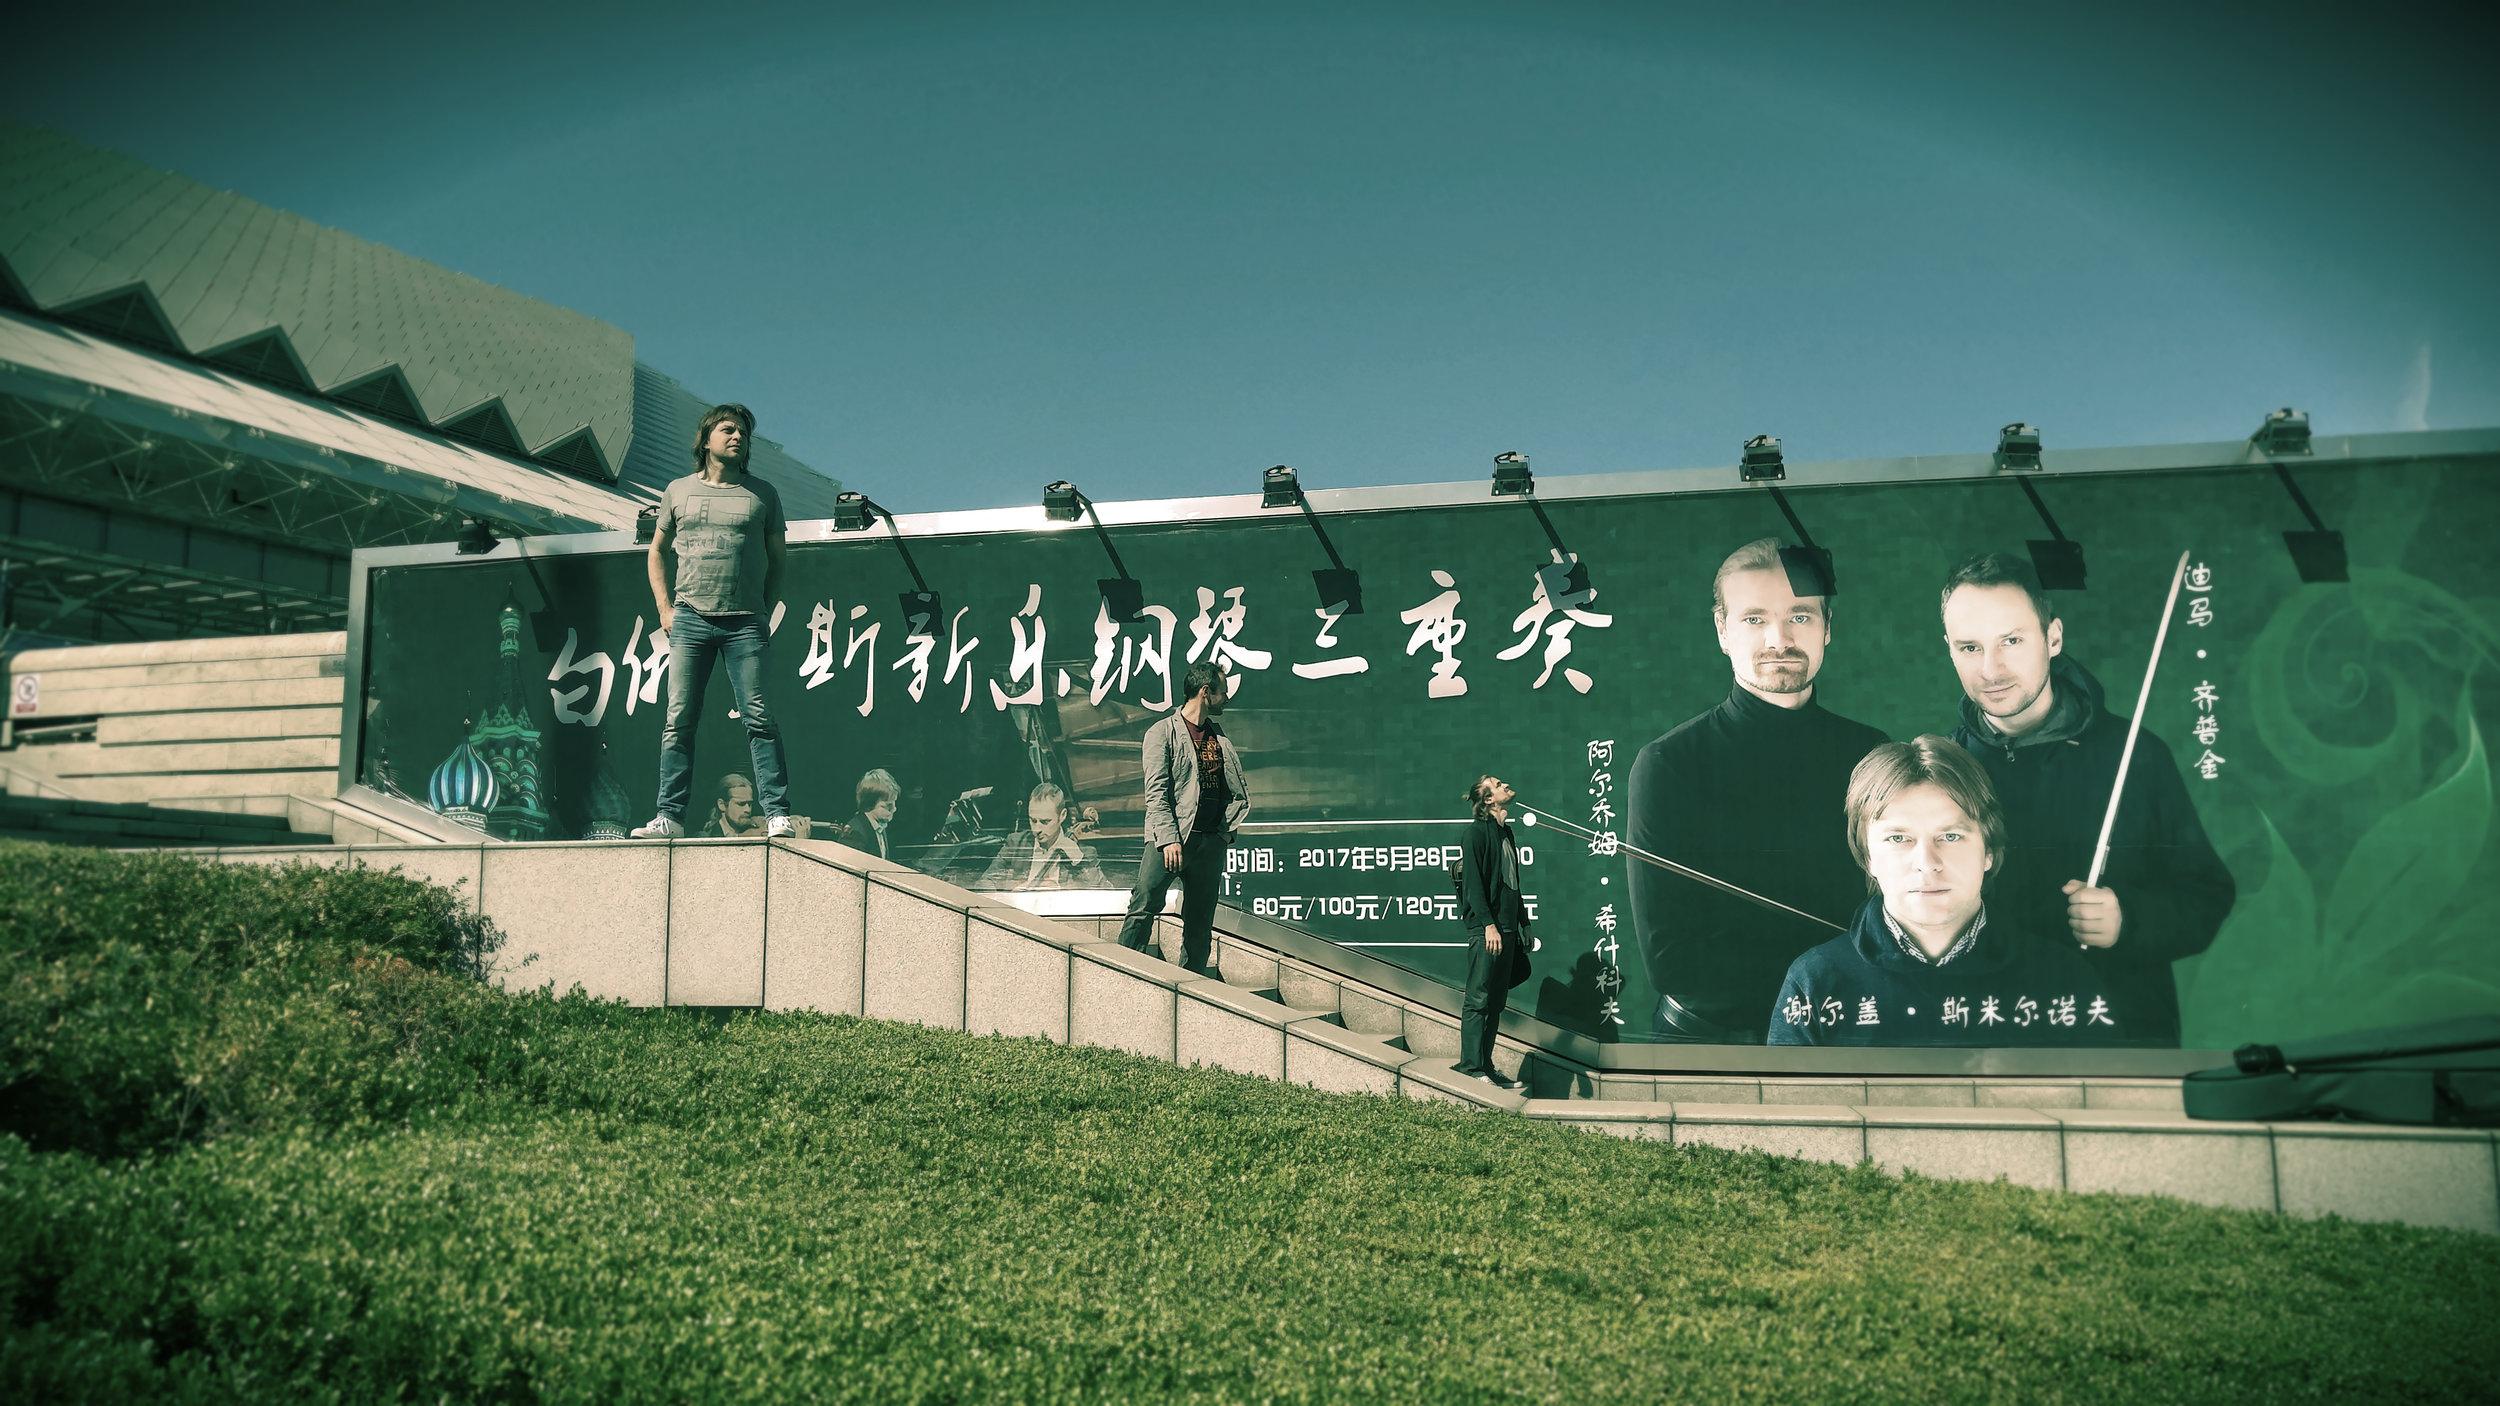 china poster big edit1 color.jpg